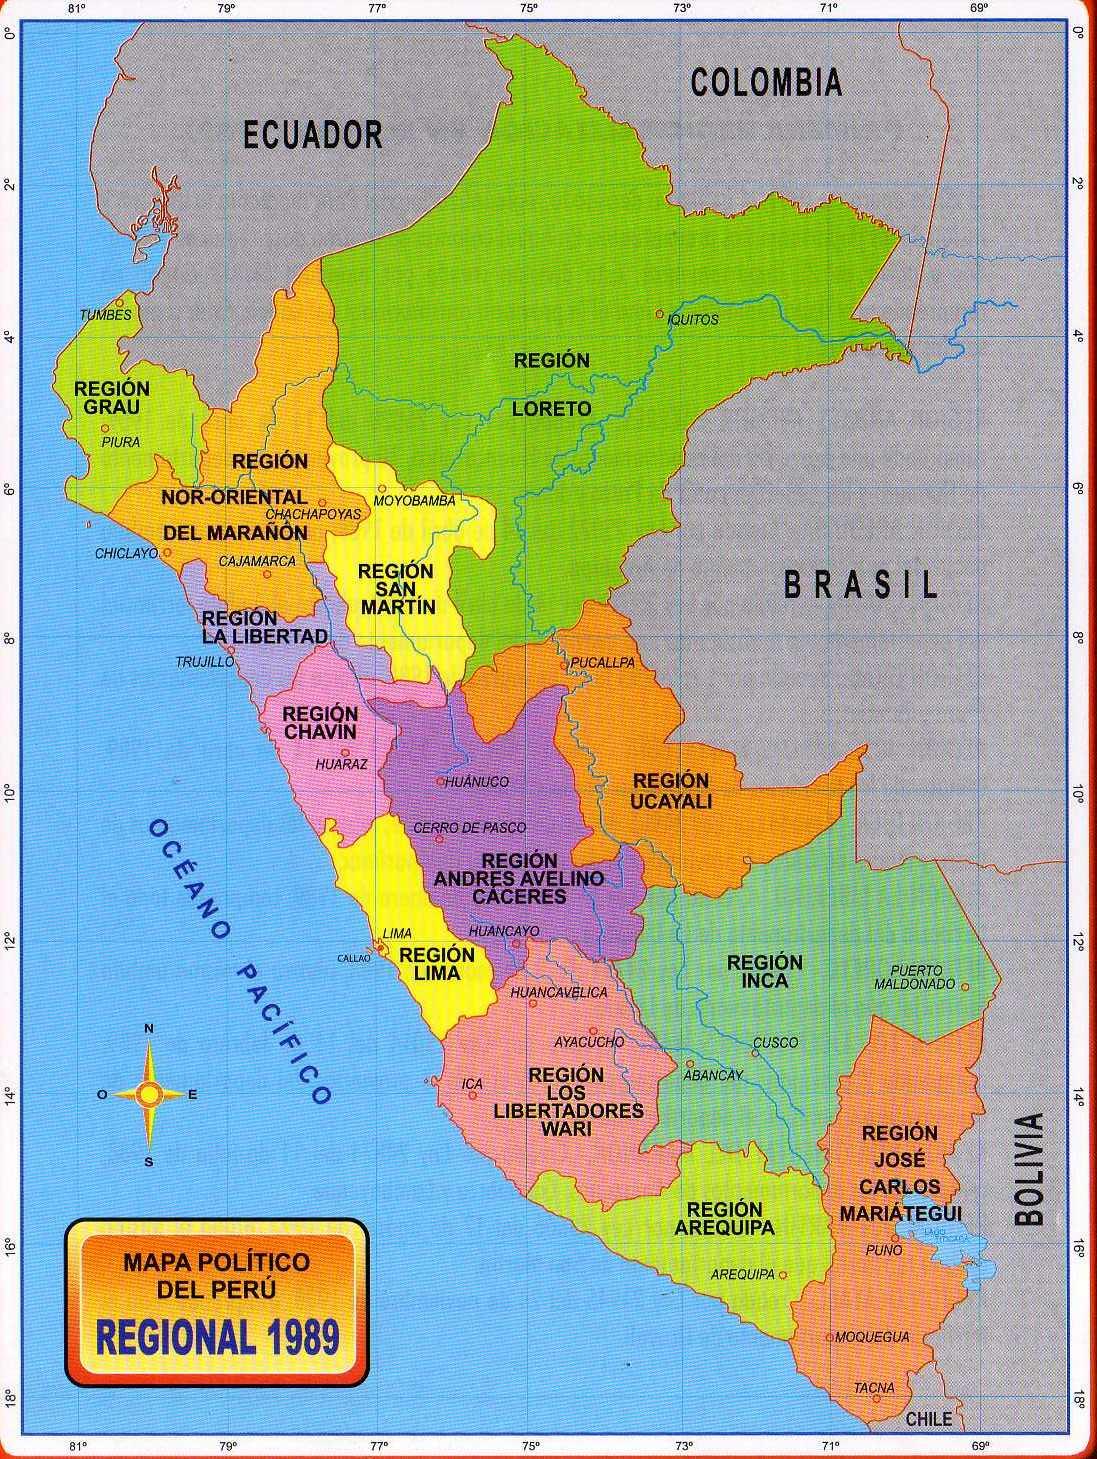 Mapa Politico Del Peru.Para Mis Tareas Mapa Politico Del Peru Regional 1989